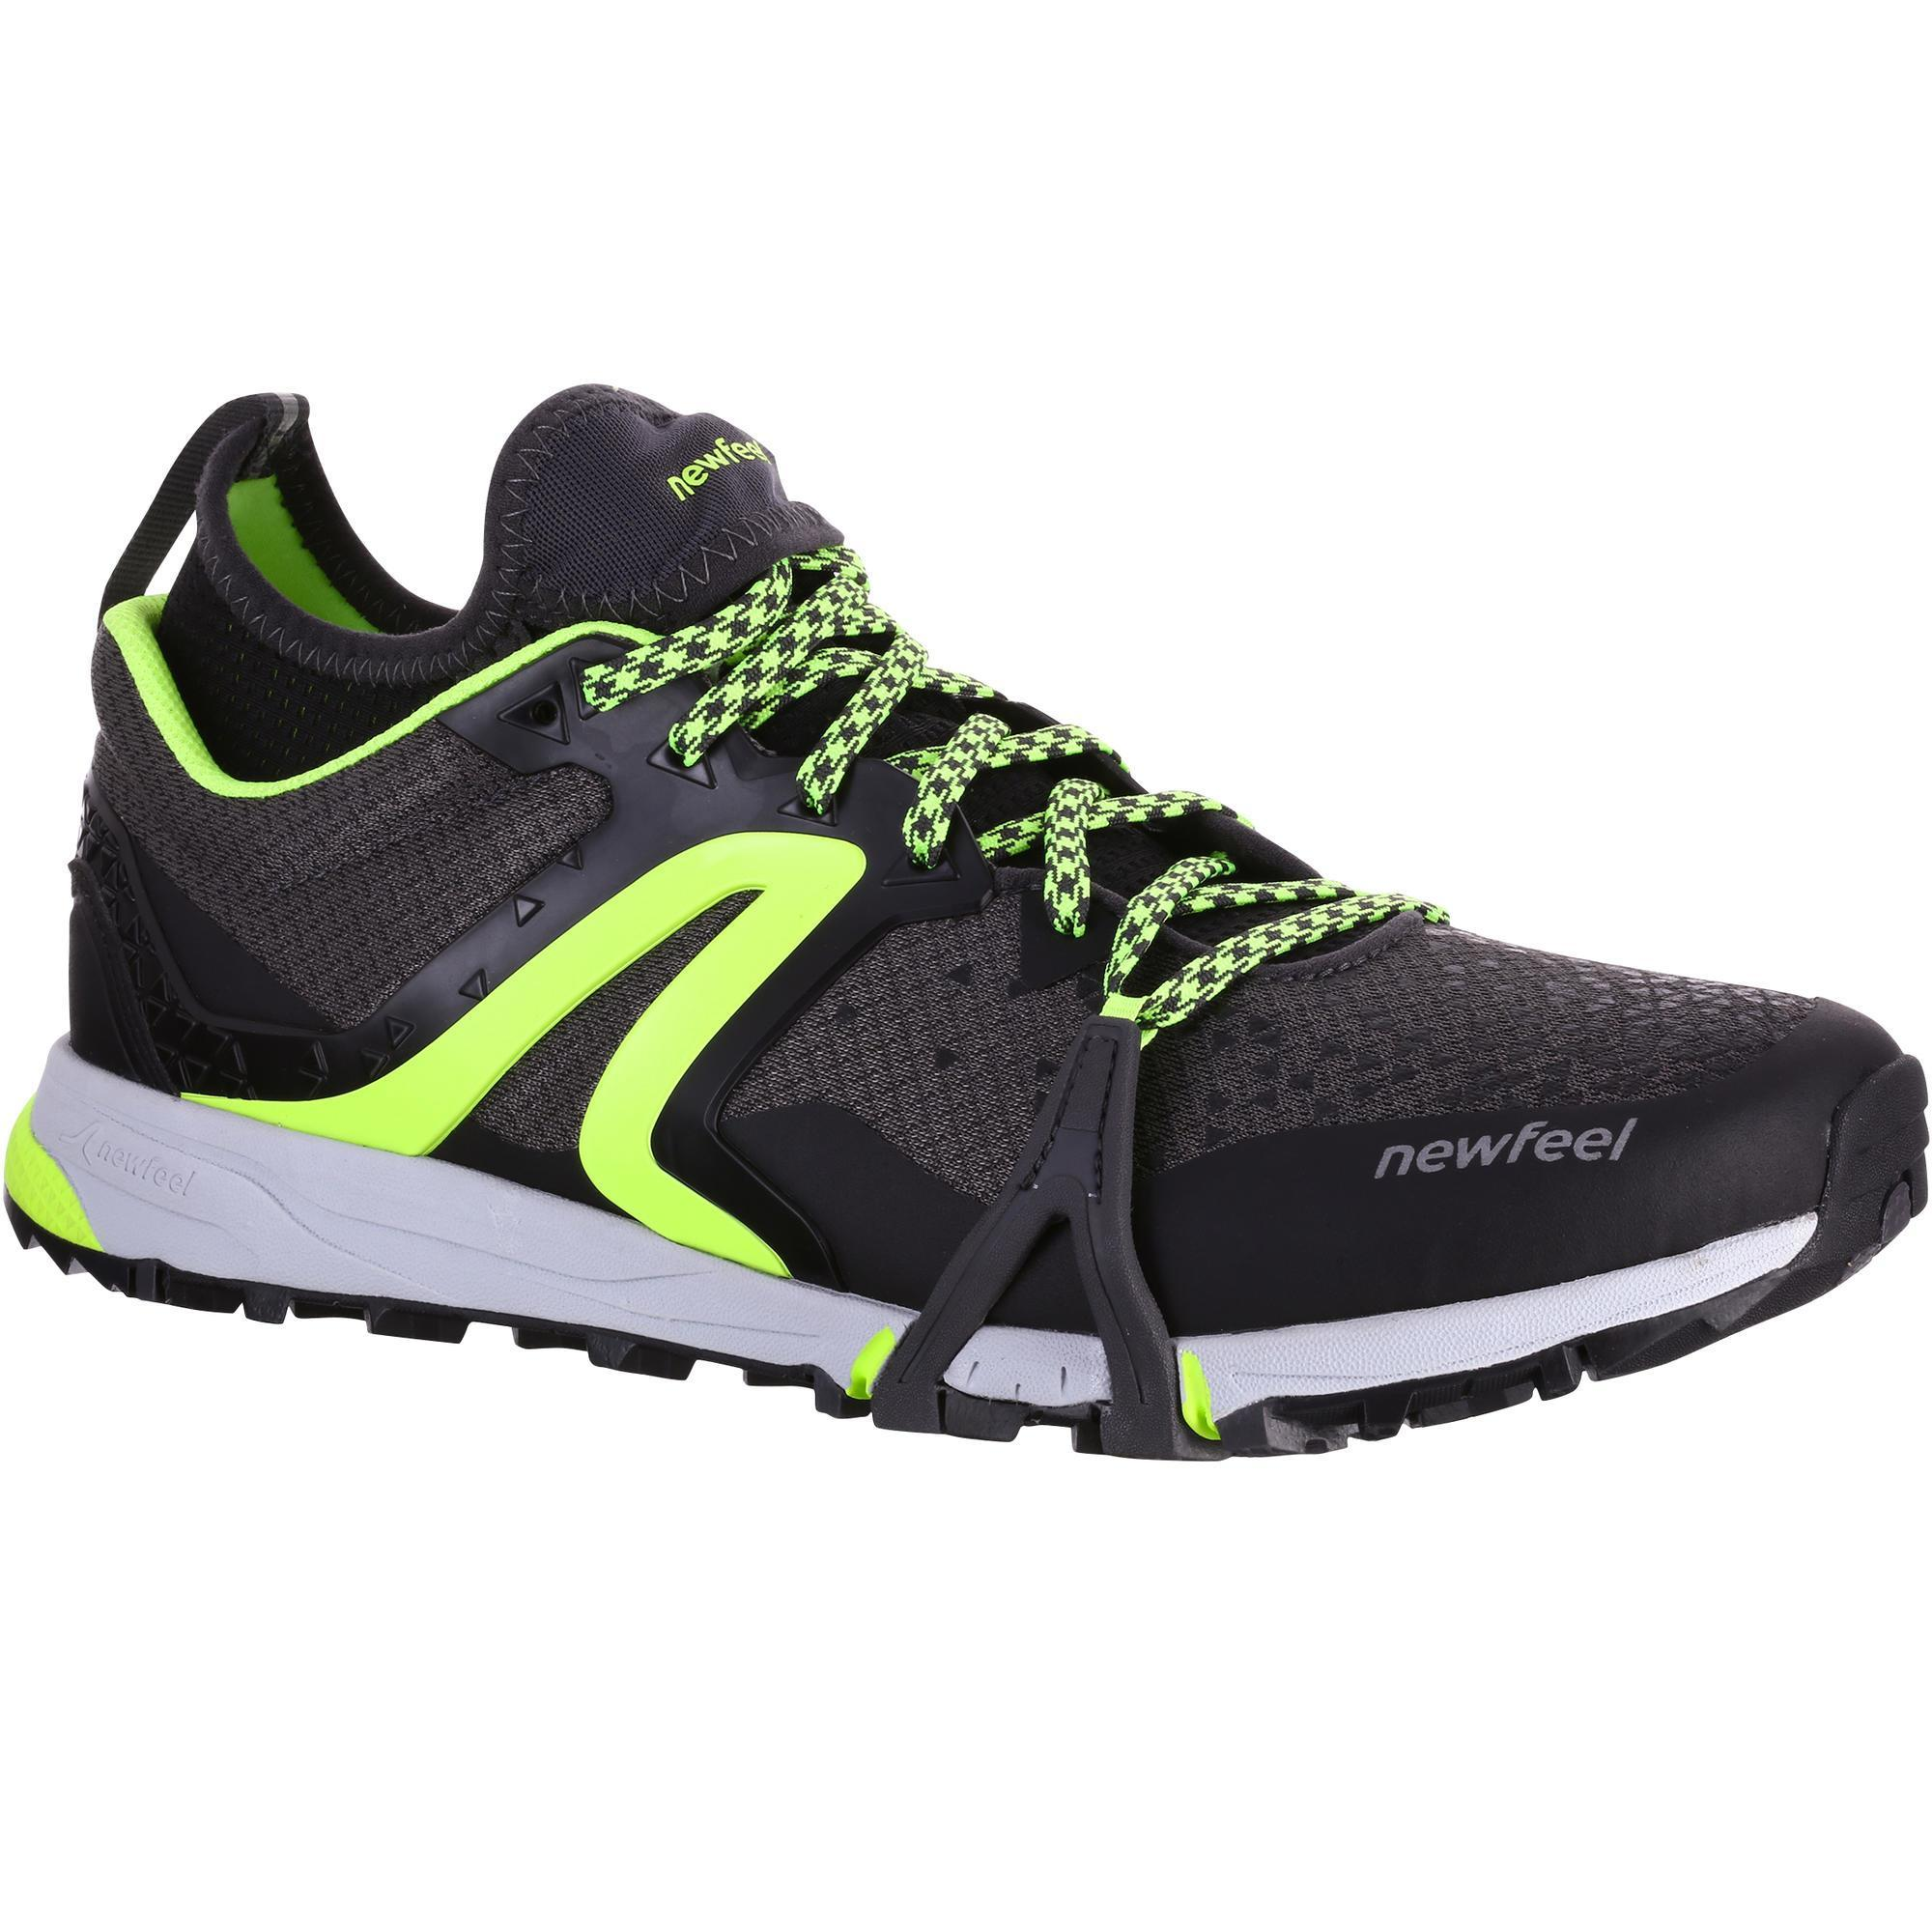 Walkingschuhe NW 900 FlexH Nordic Walking Herren | Schuhe > Sportschuhe > Walkingschuhe | Newfeel